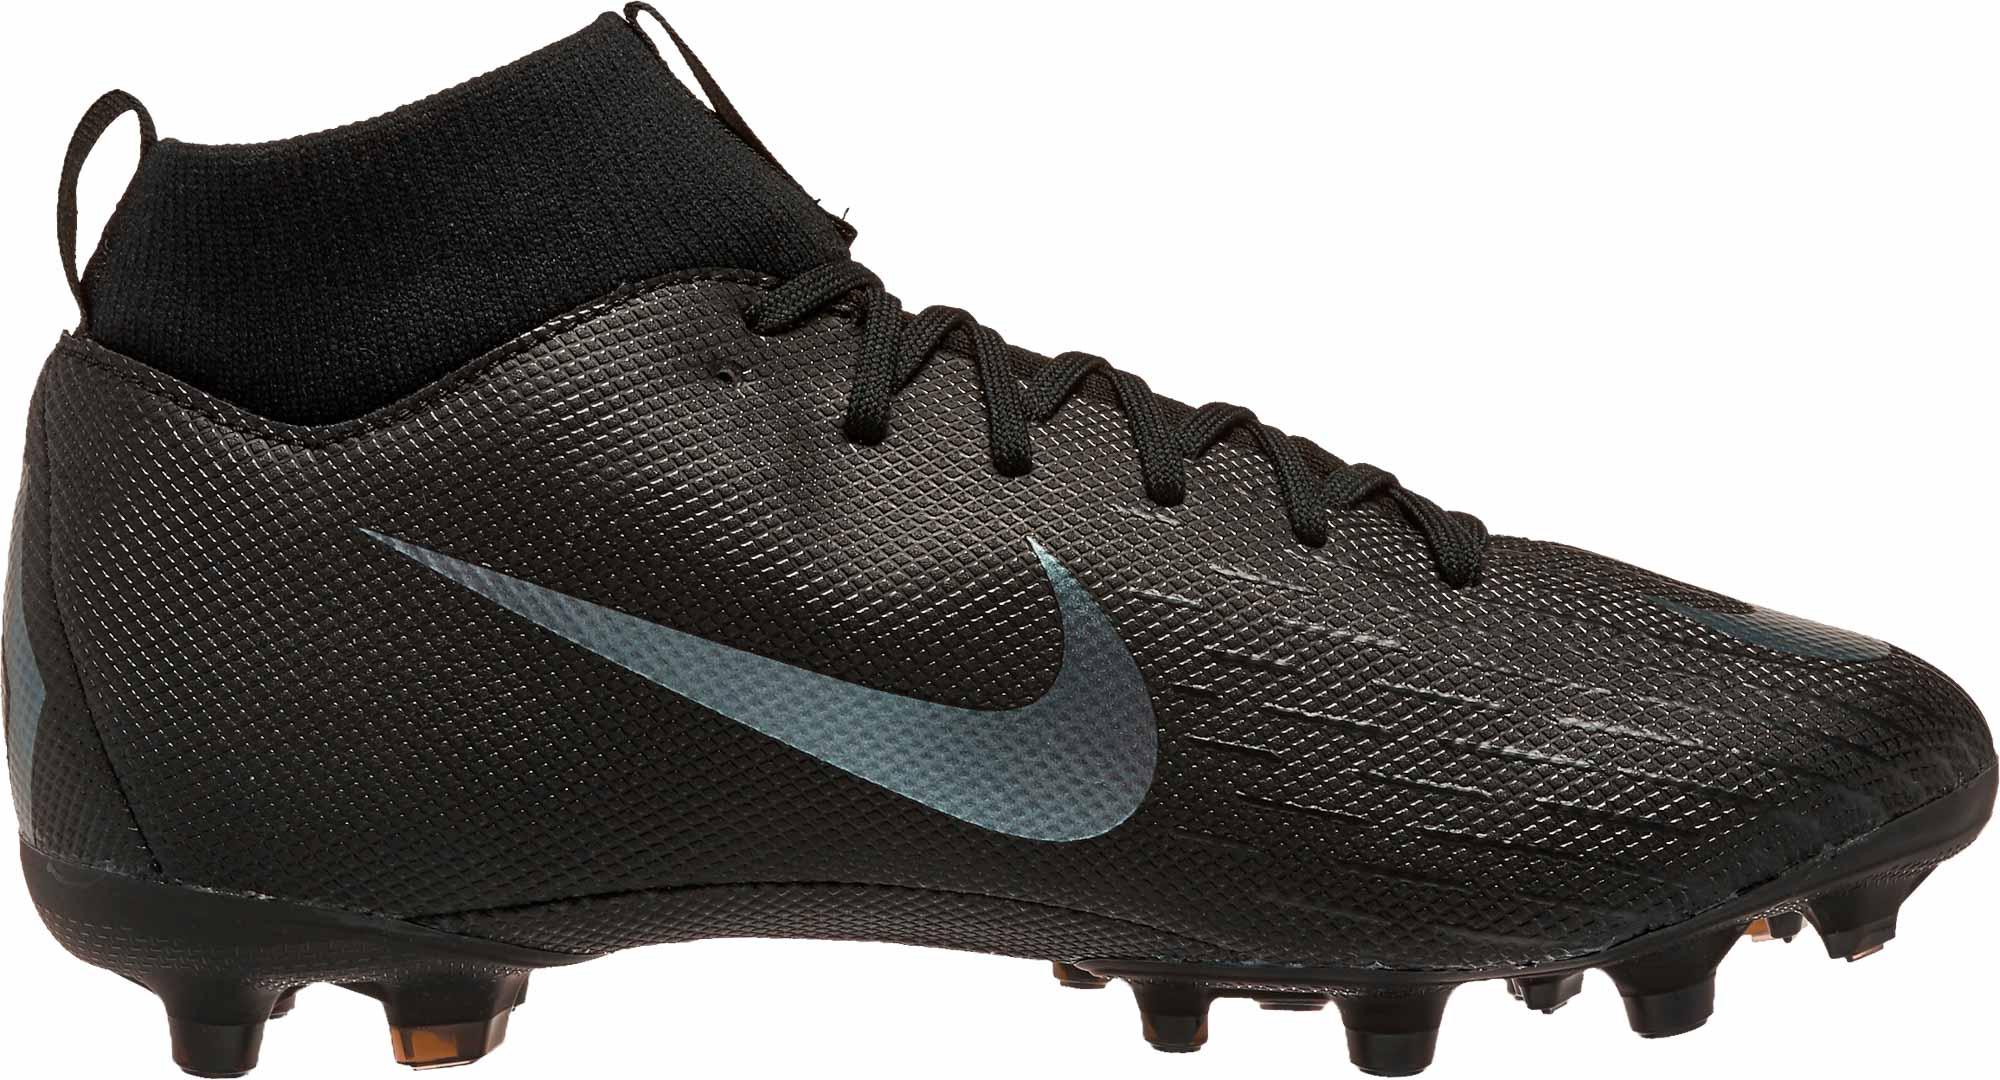 uk availability 4004d 892cc Nike Mercurial Superfly 6 Academy MG - Youth - Black/Black - SoccerPro